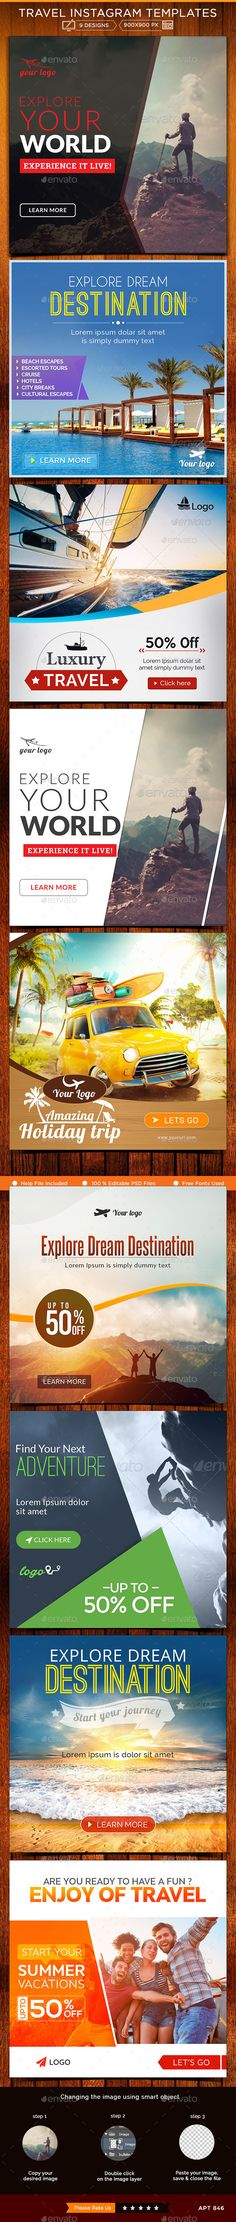 Travel Instagram Templates - 9 Designs  #design #ads #web Download: http://graphicriver.net/item/travel-instagram-templates-9-designs/12482524?ref=ksioks